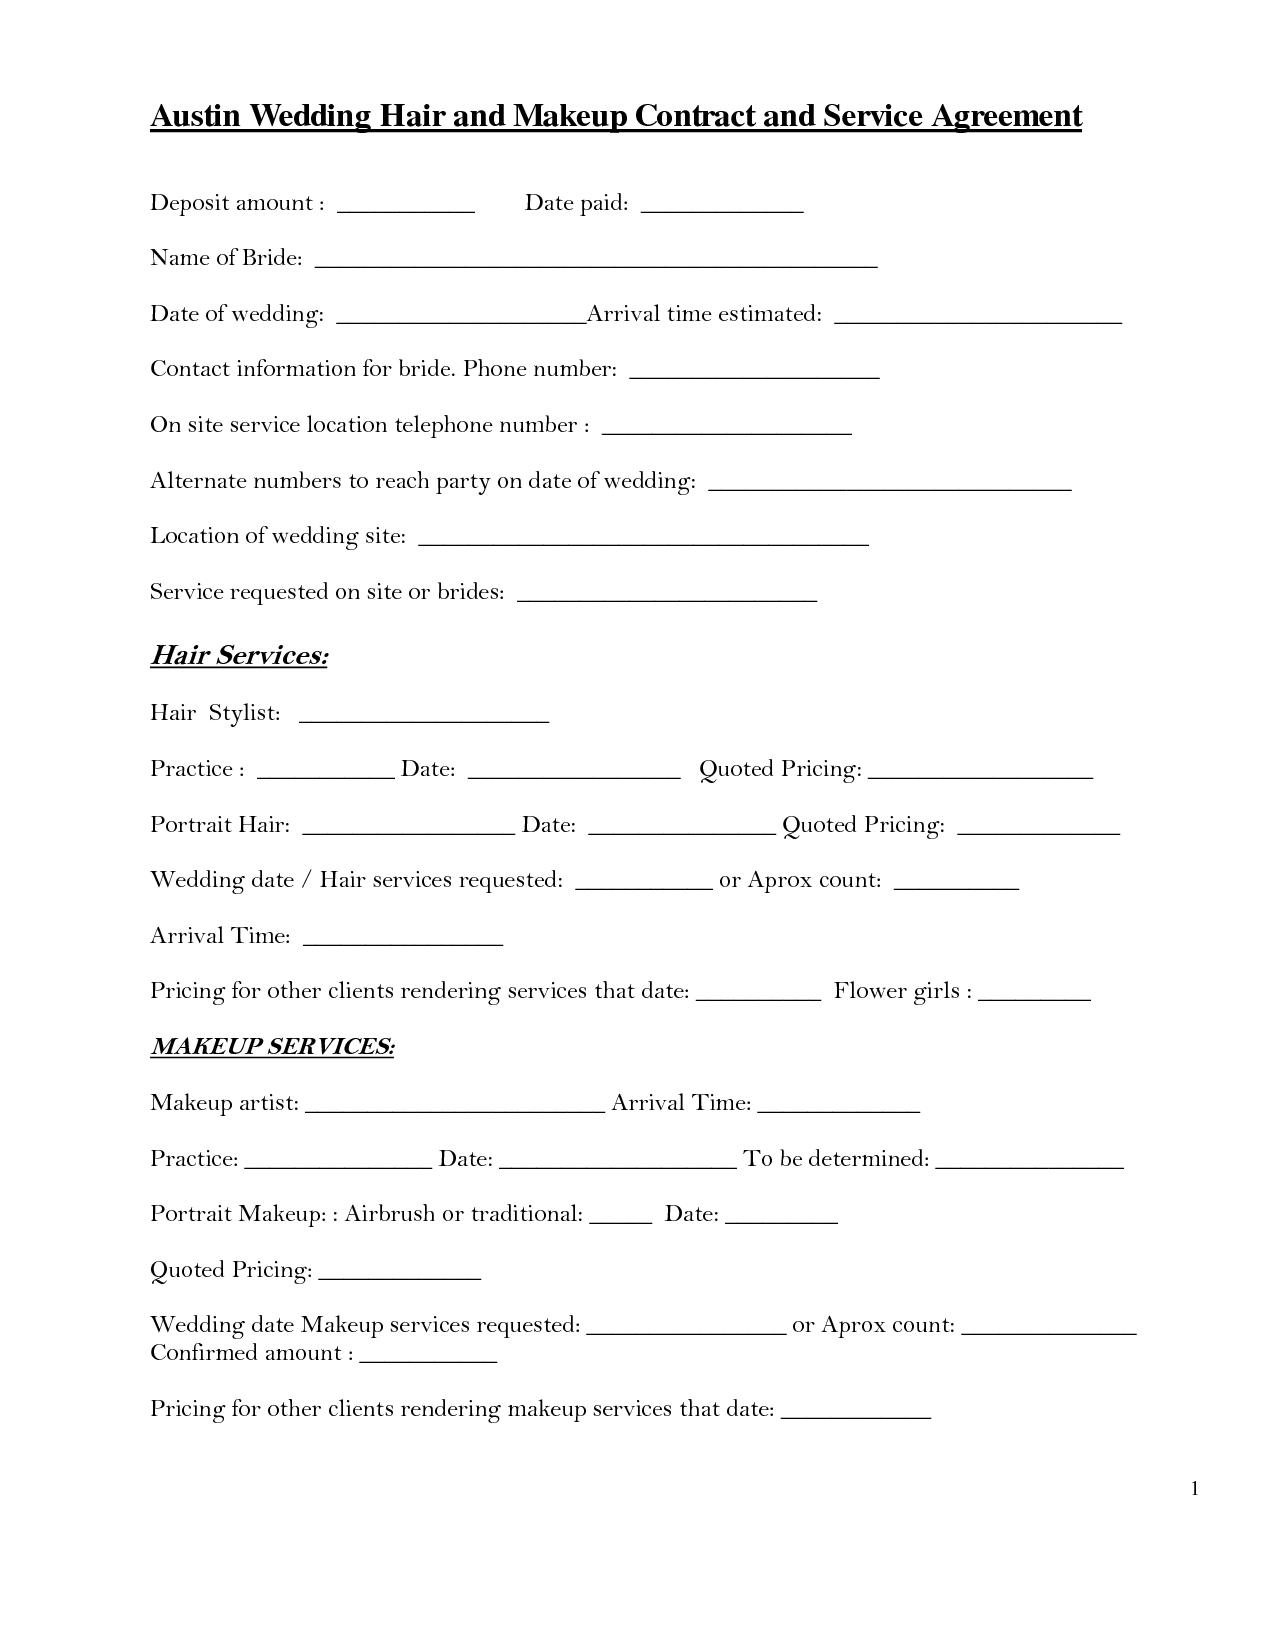 bridalhaircotract | austin wedding hair and makeup contract